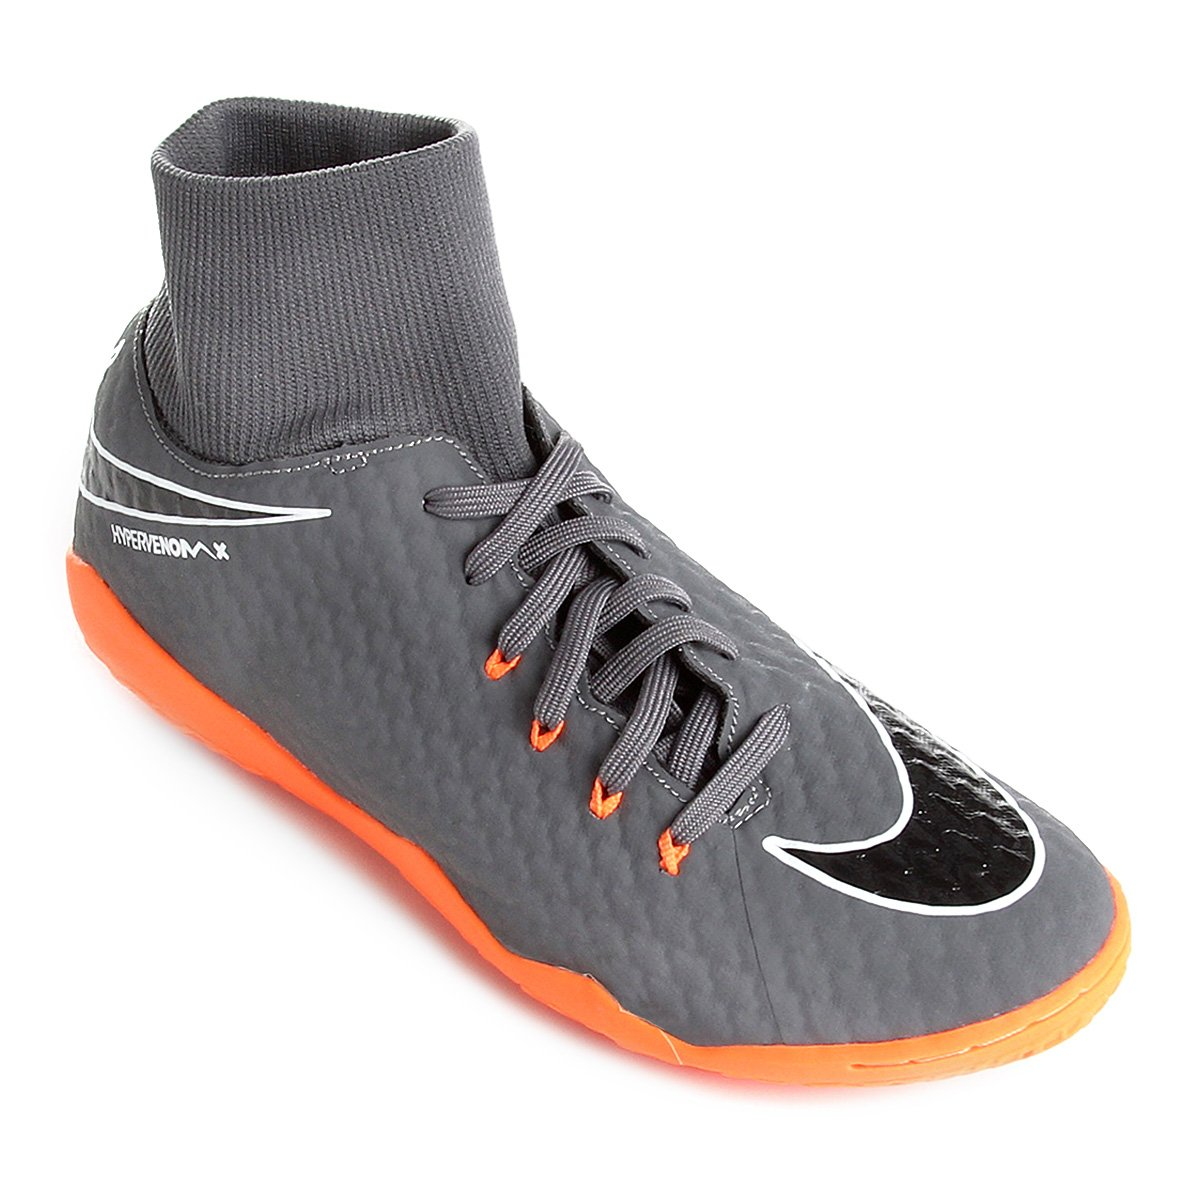 Chuteira Futsal Nike Hypervenom Phantom 3 Academy DF IC ef1ce26eca9b3